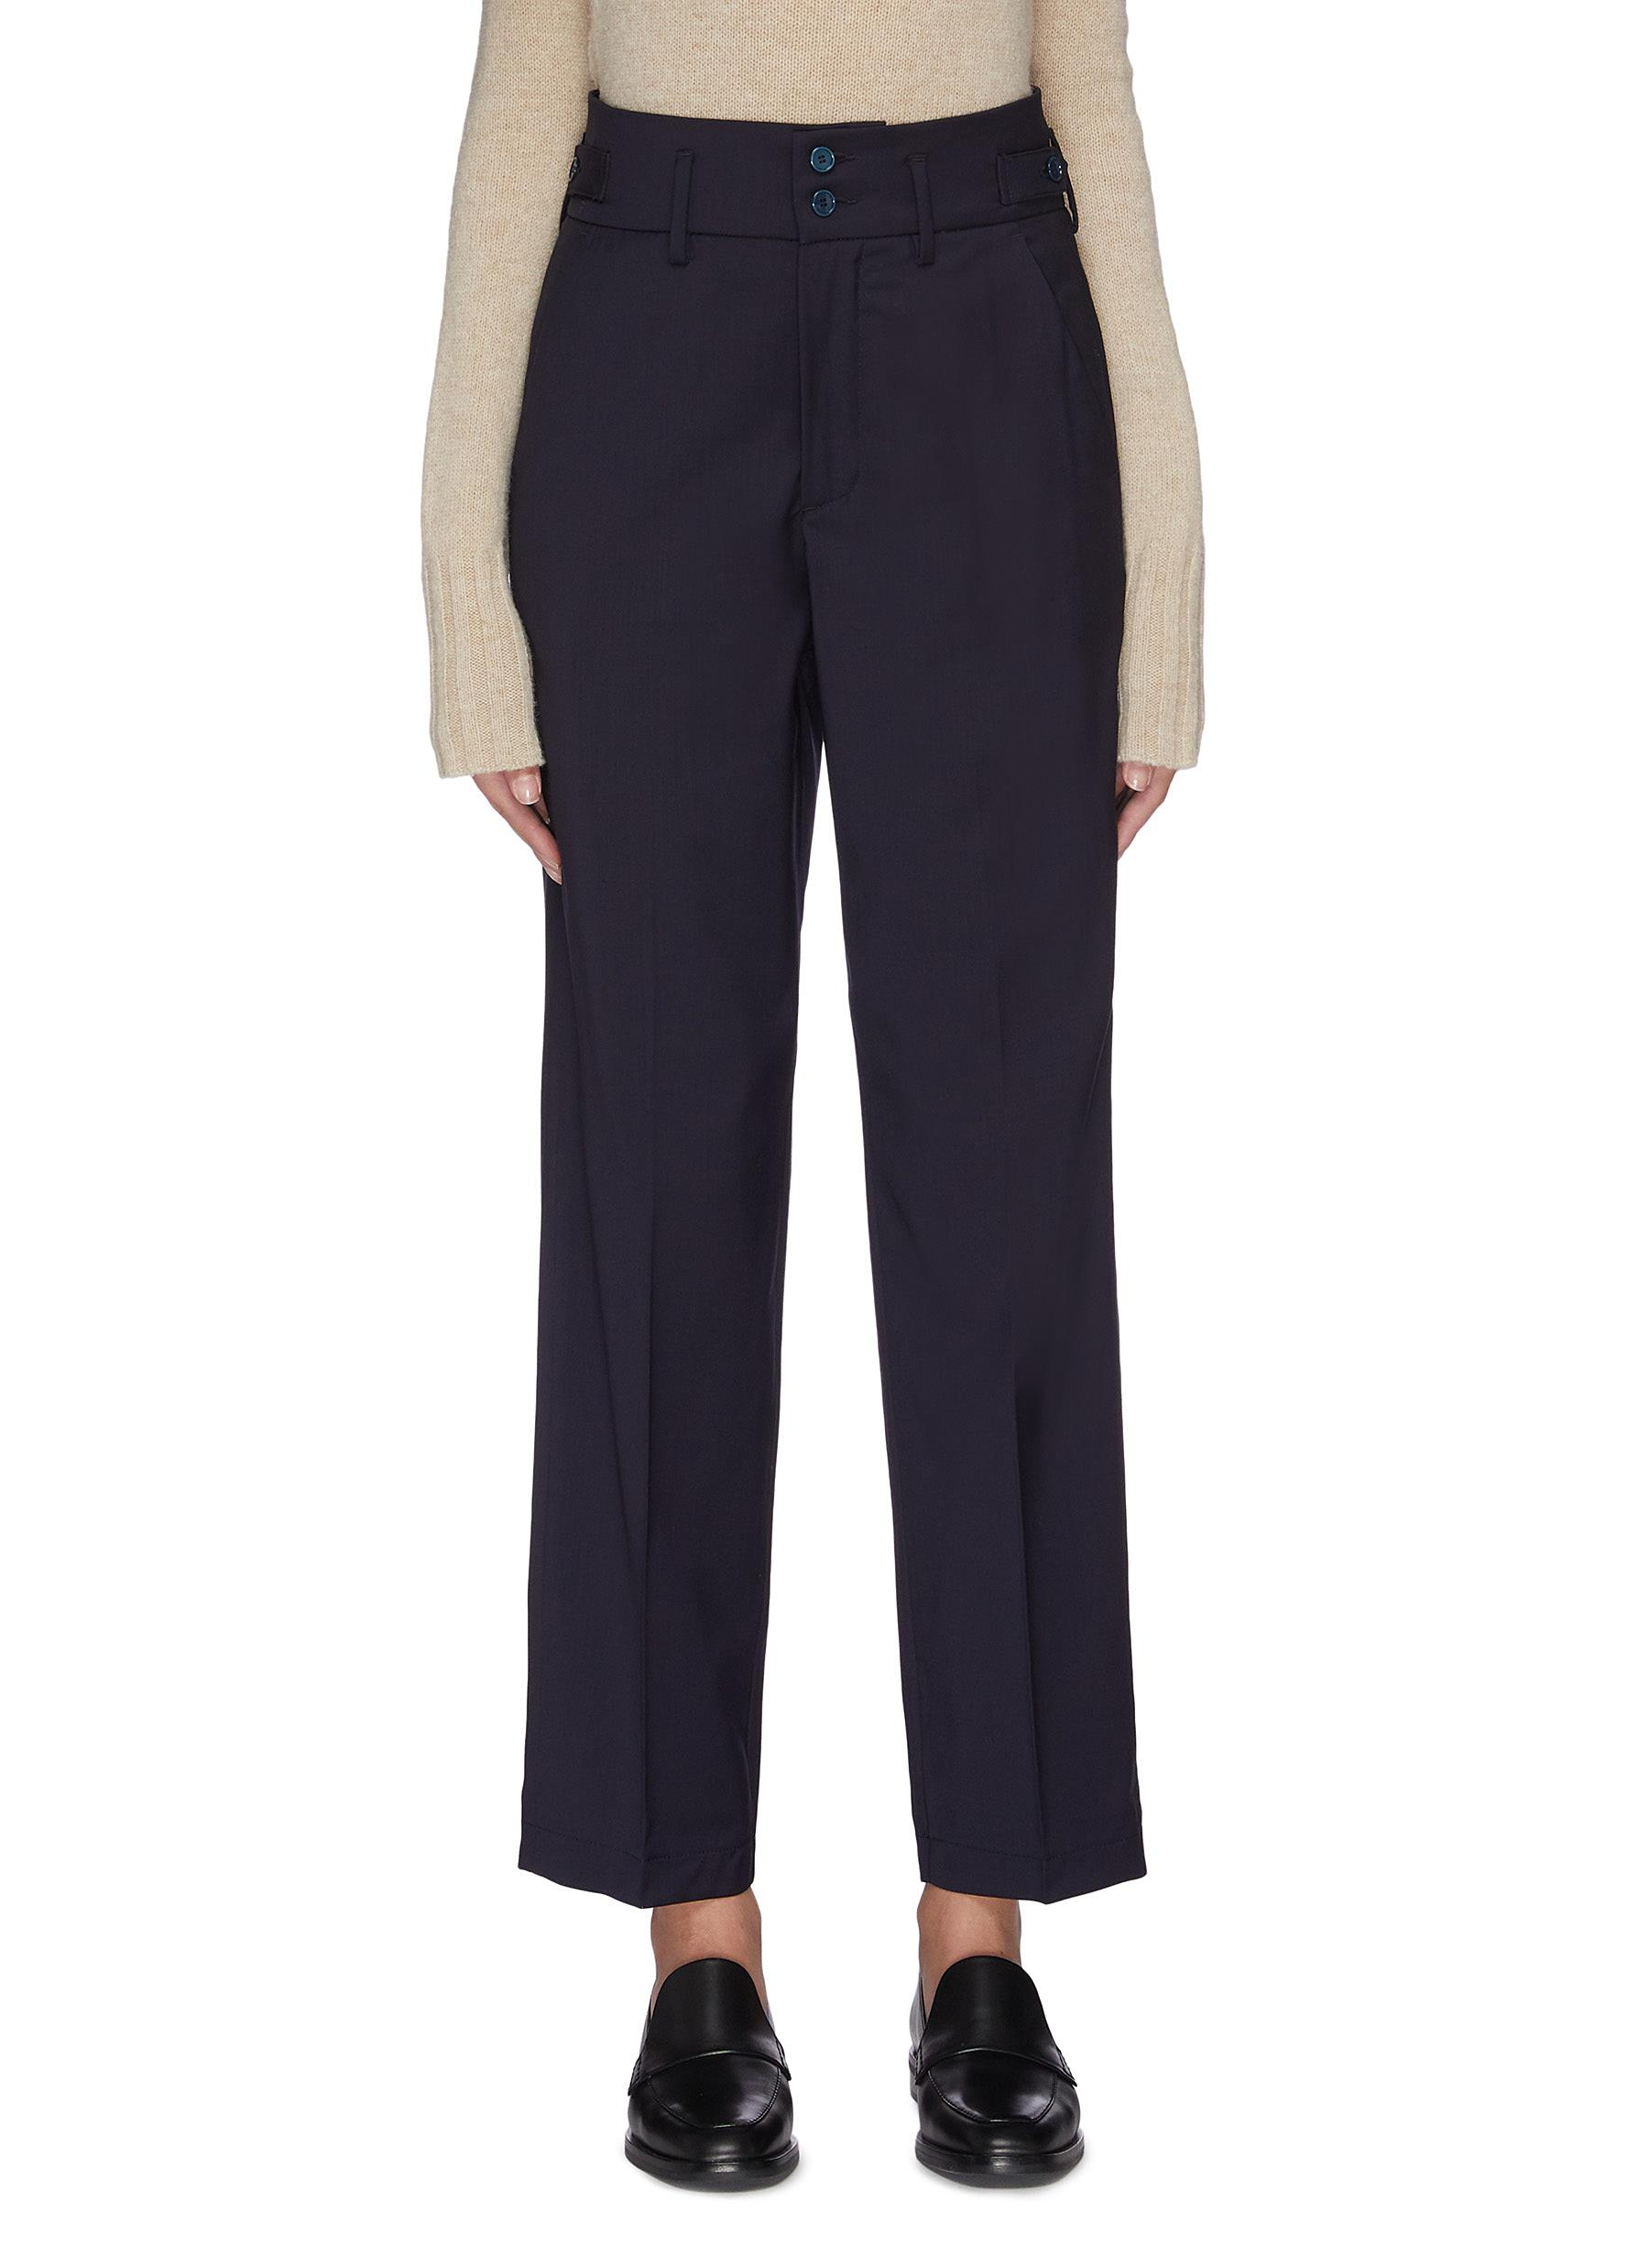 Buy Barena Pants & Shorts 'Franco' double button virgin wool suiting pants